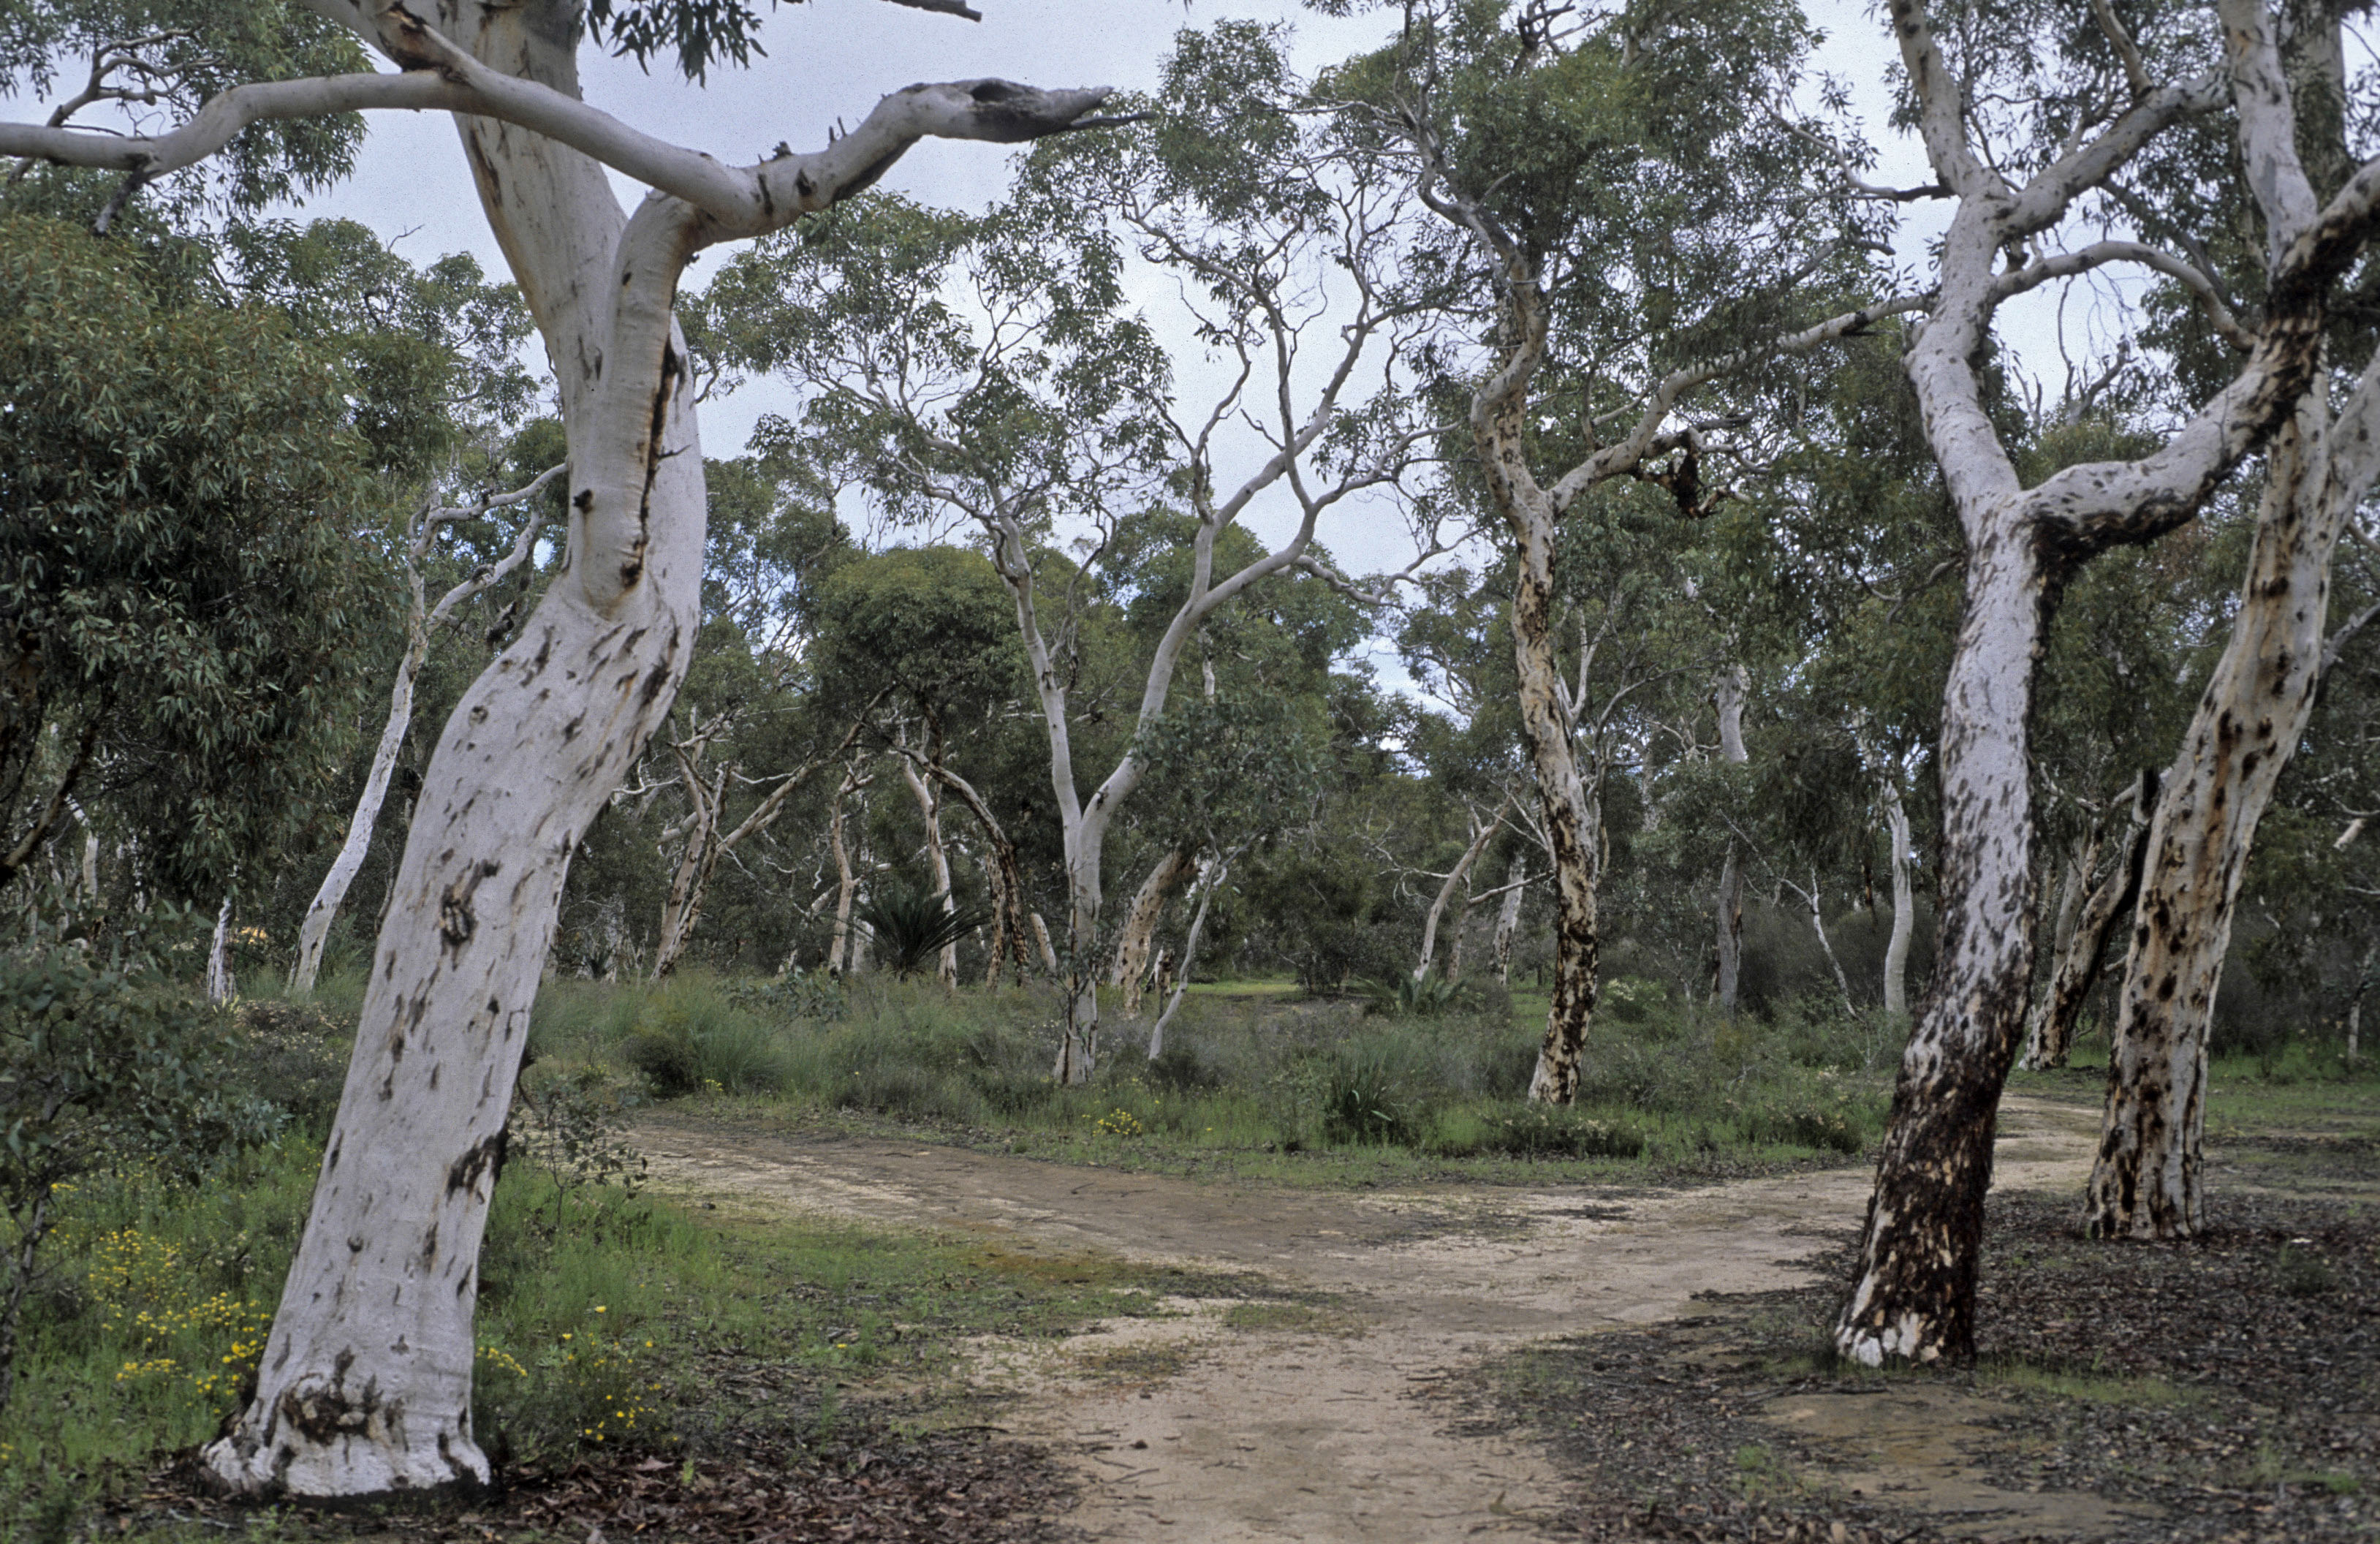 Eucalyptus wandoo